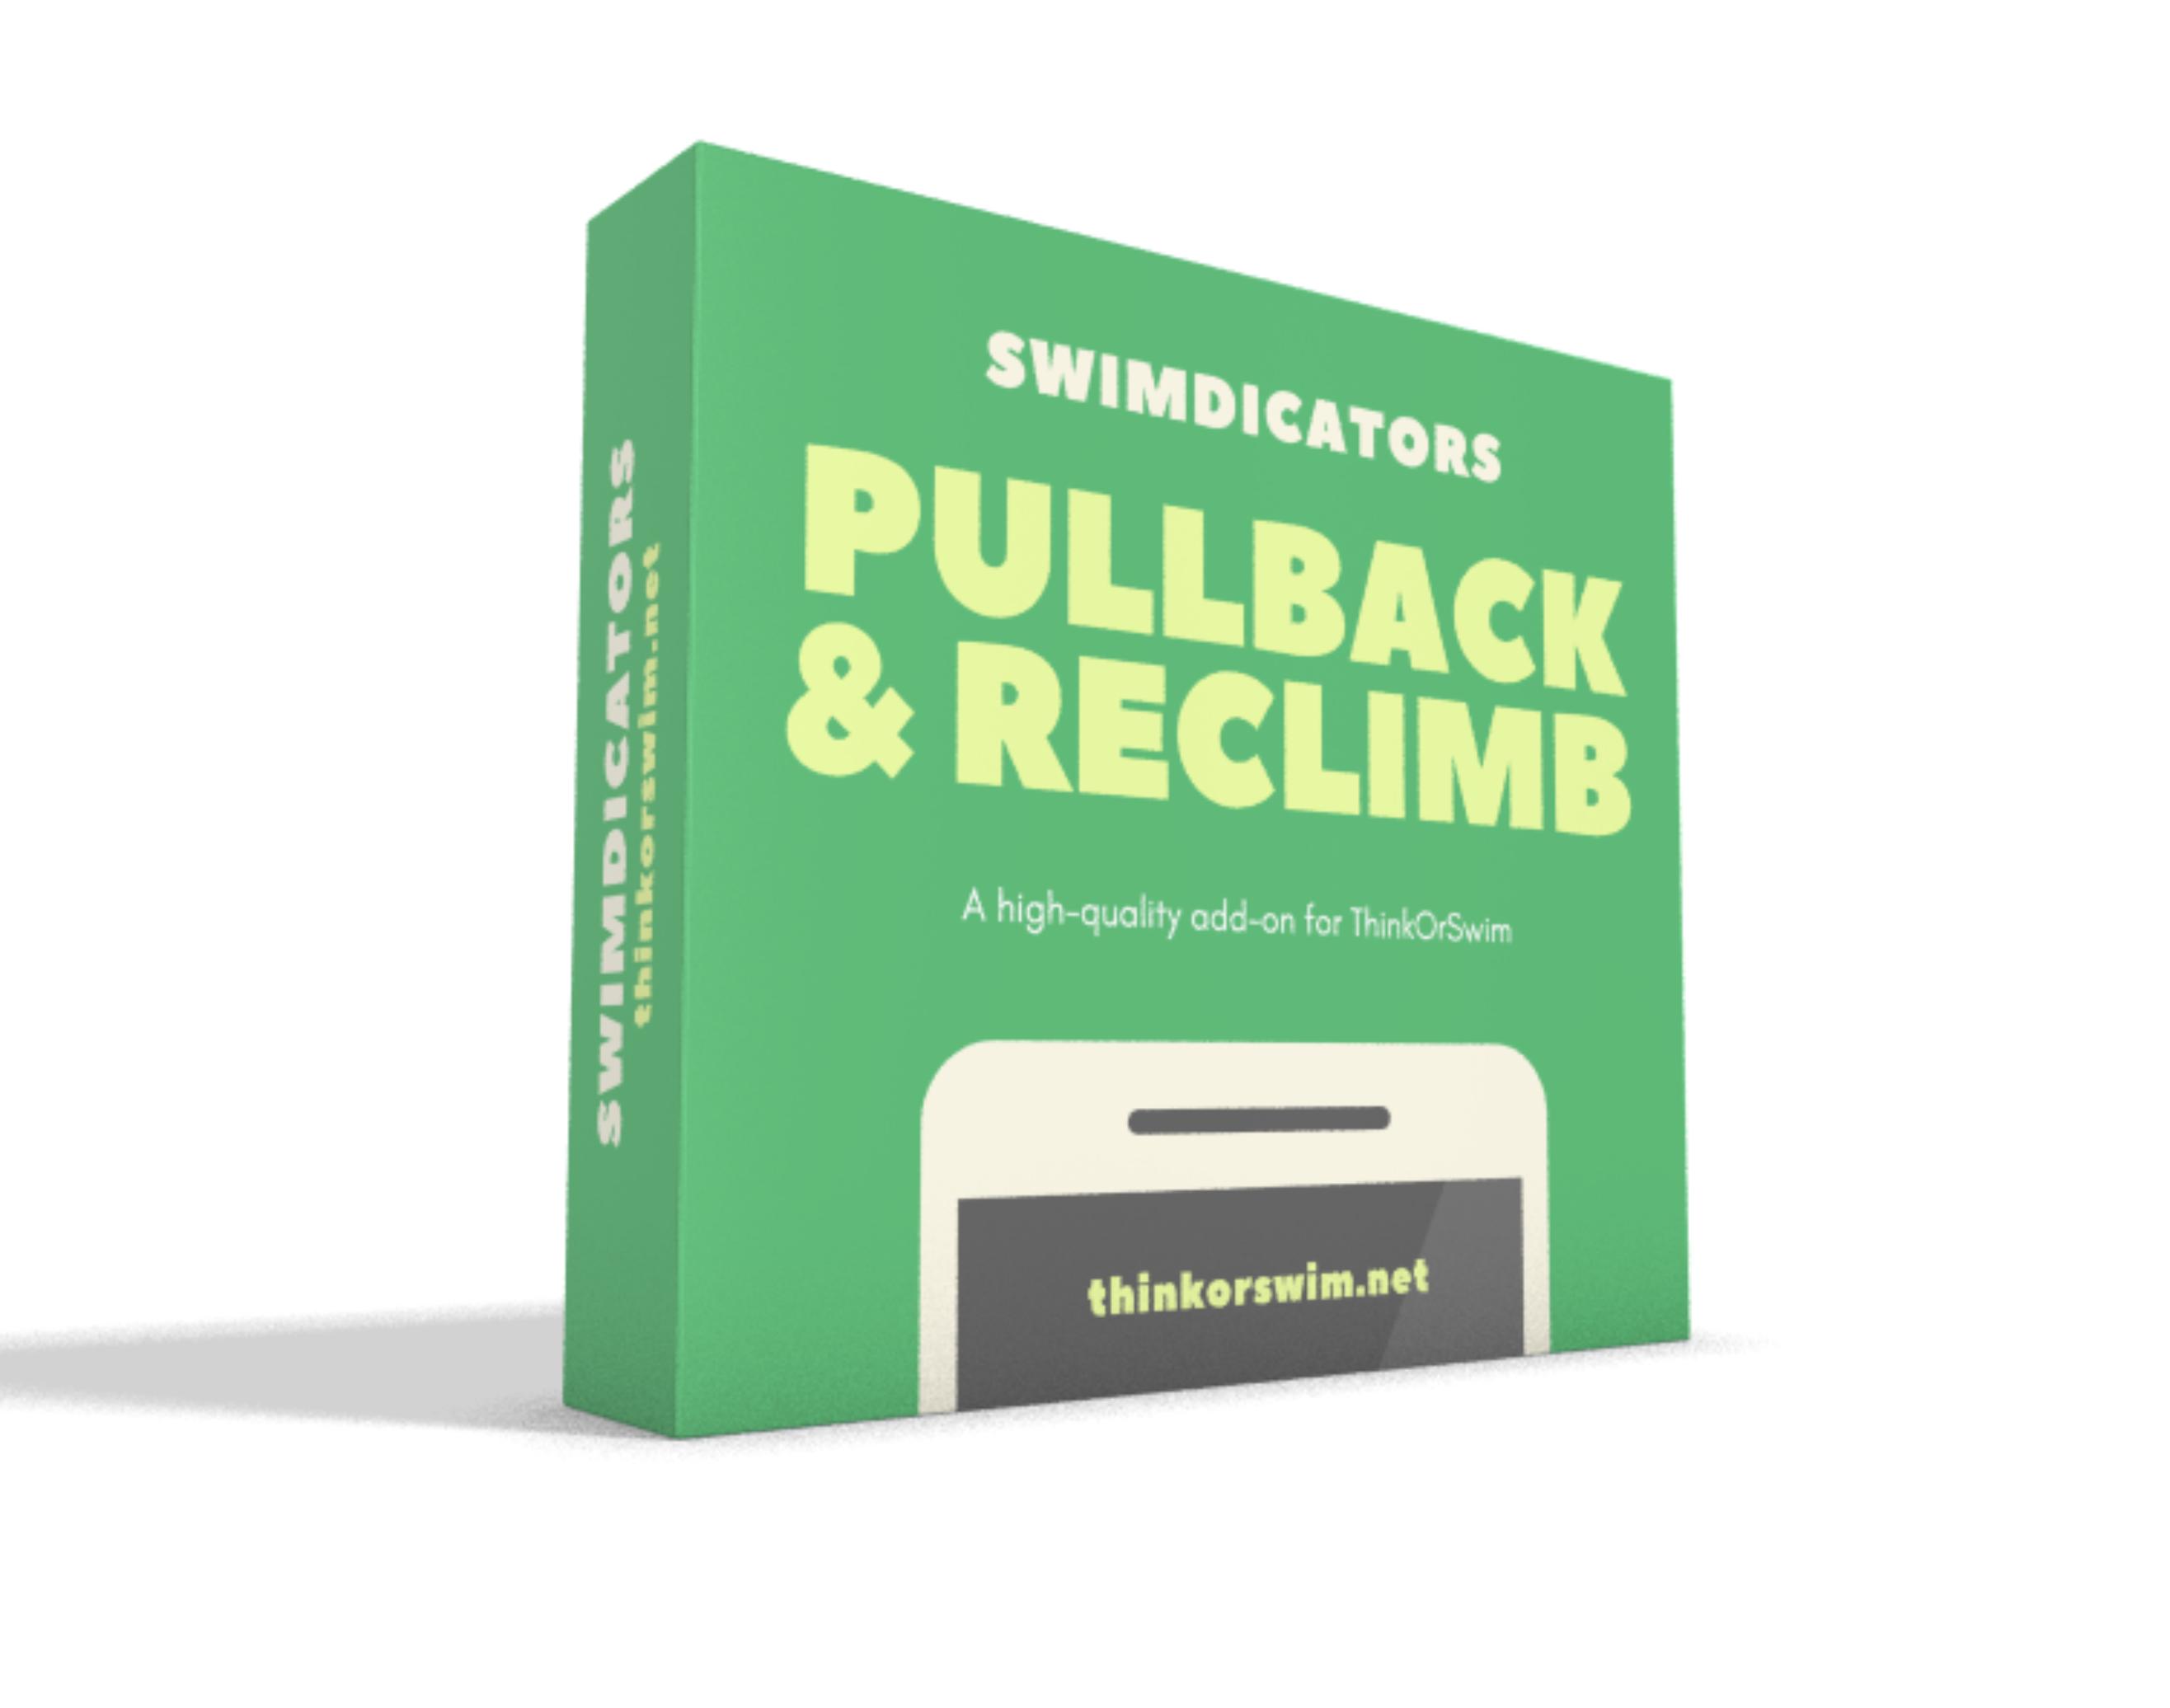 2 period rsi pullback trading strategy pdf